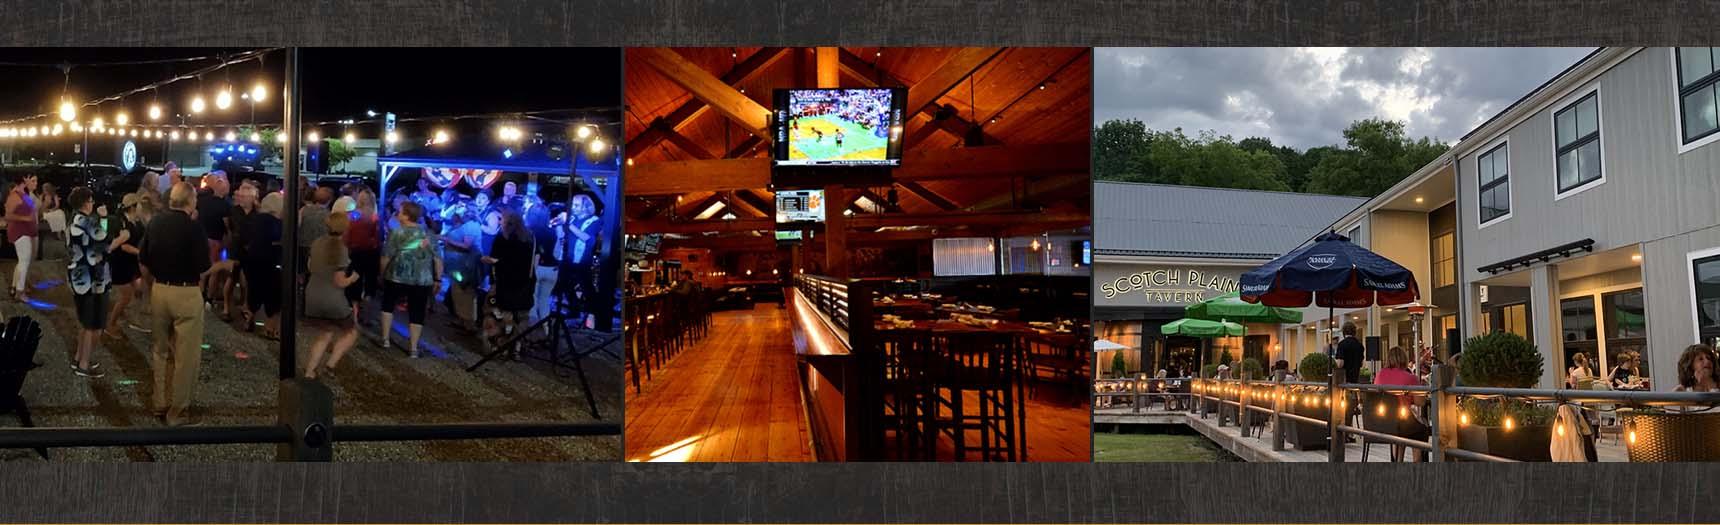 Scotch Plains Tavern Music Sports image